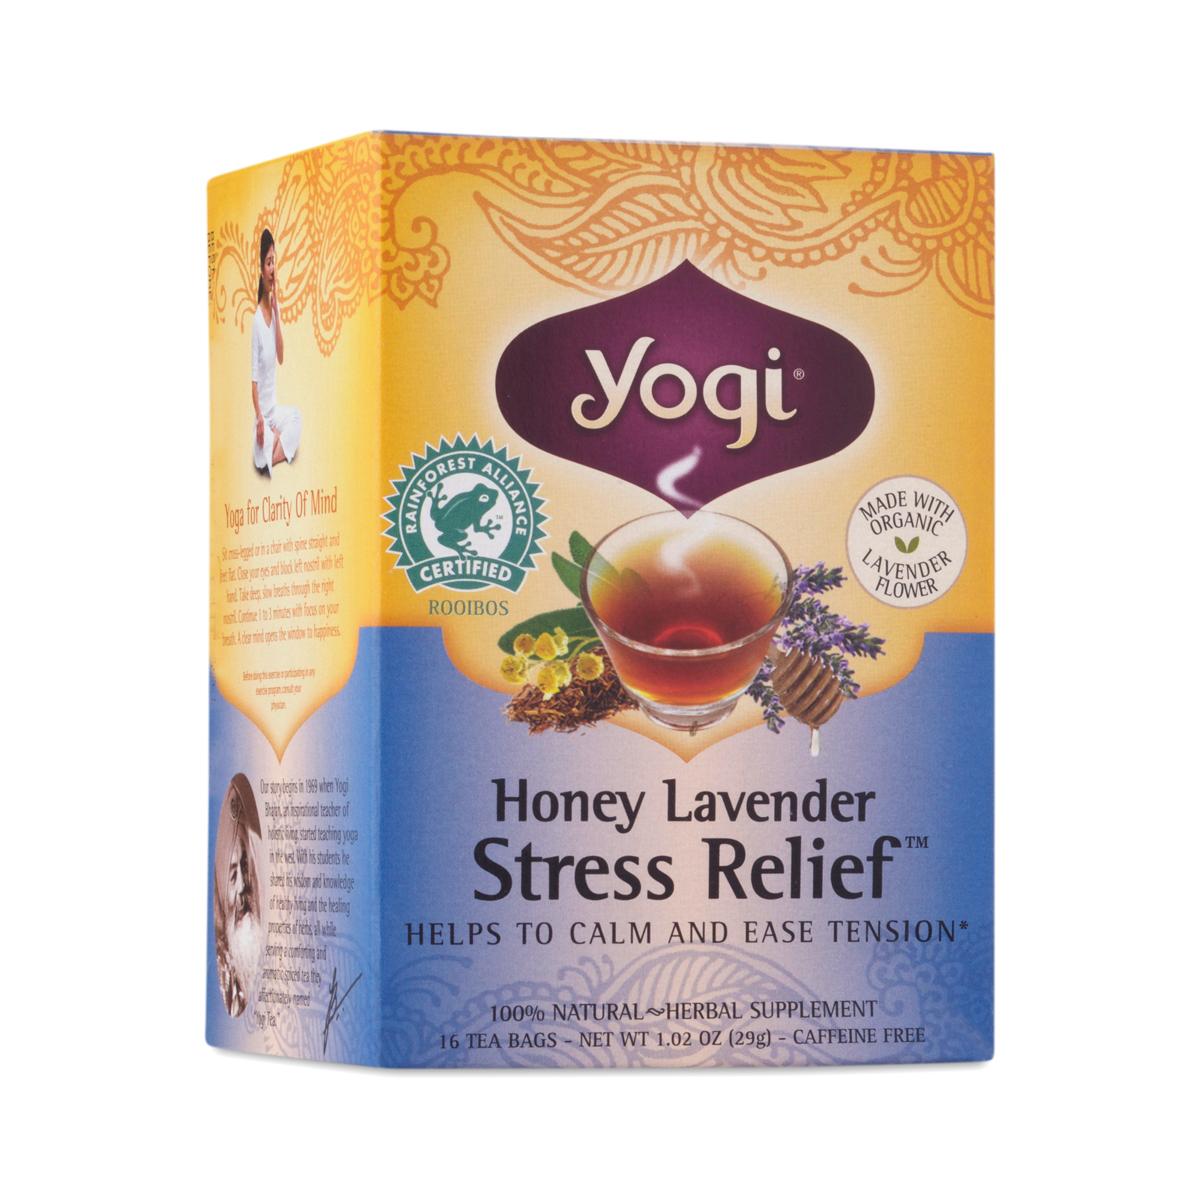 Yogi's Stress Relief Tea